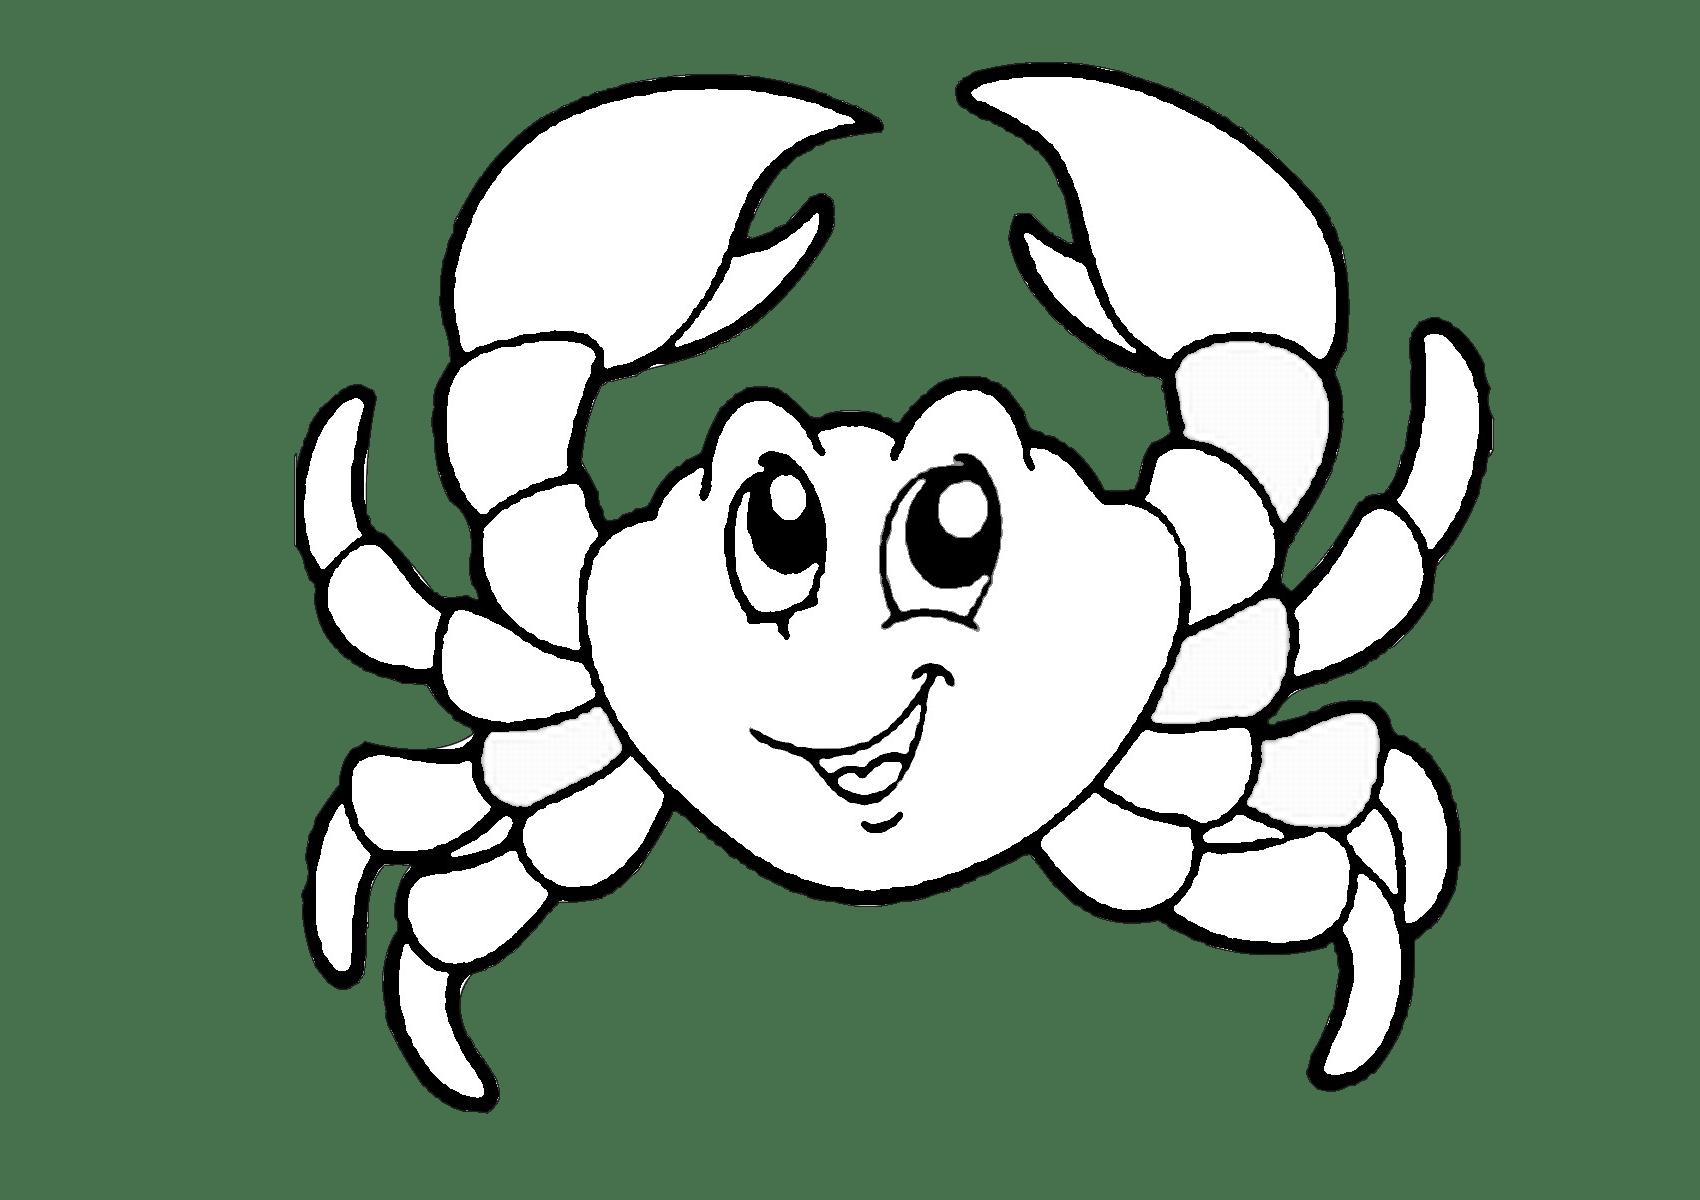 Printable Easy Cartoon Crab Coloring Pages For Preschool